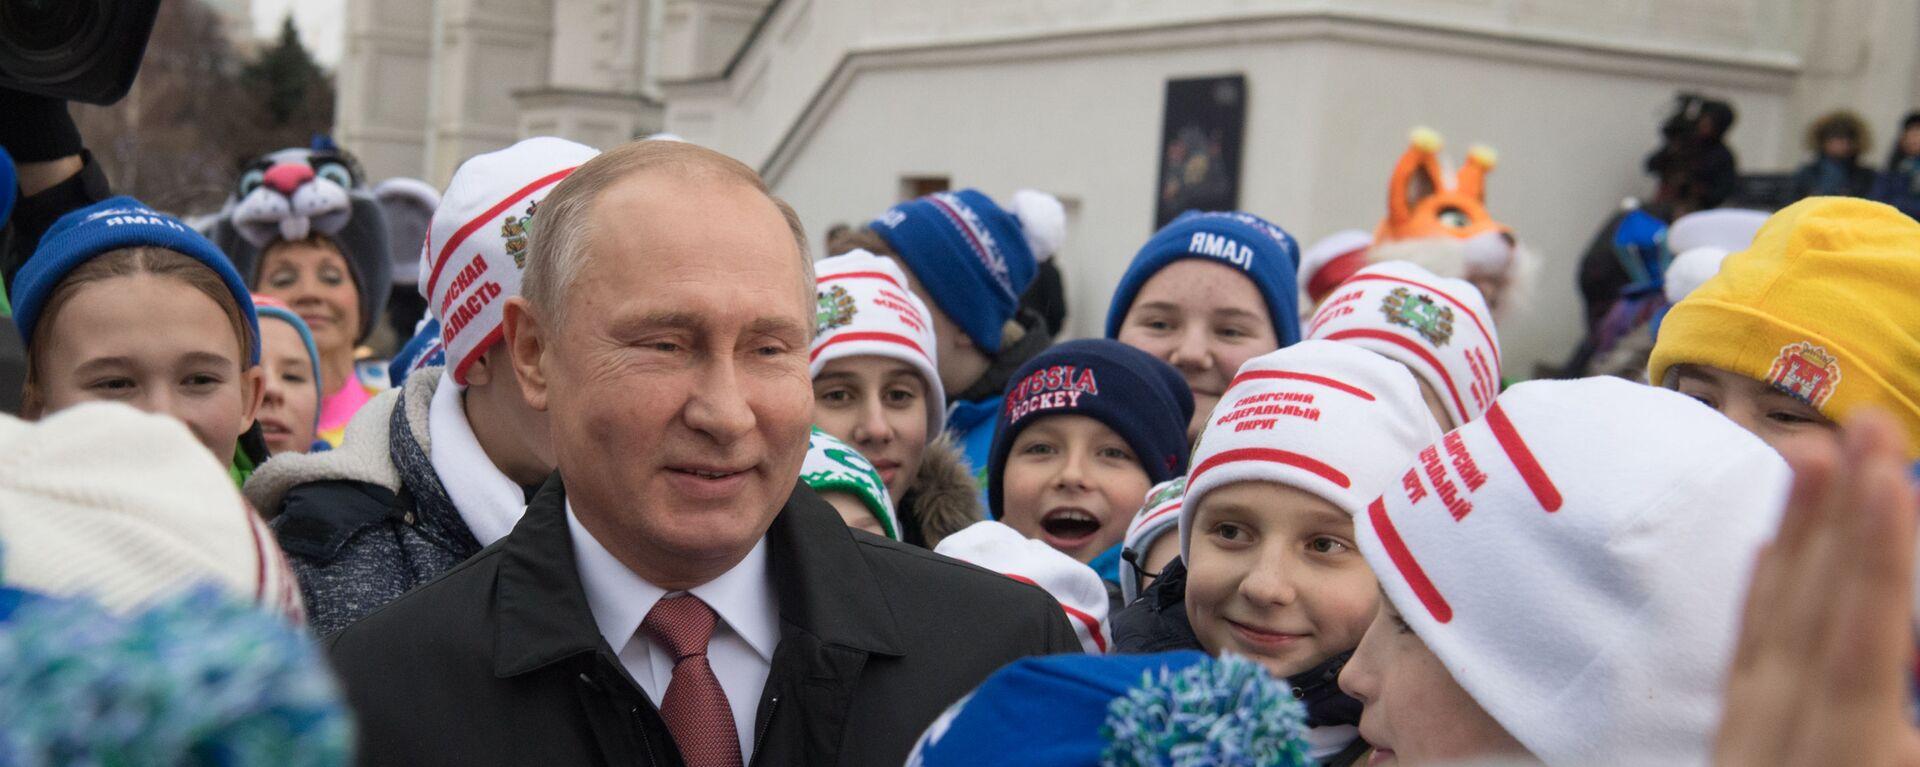 Президент РФ Владимир Путин во время встречи на Соборной площади с детьми - Sputnik Таджикистан, 1920, 30.03.2021